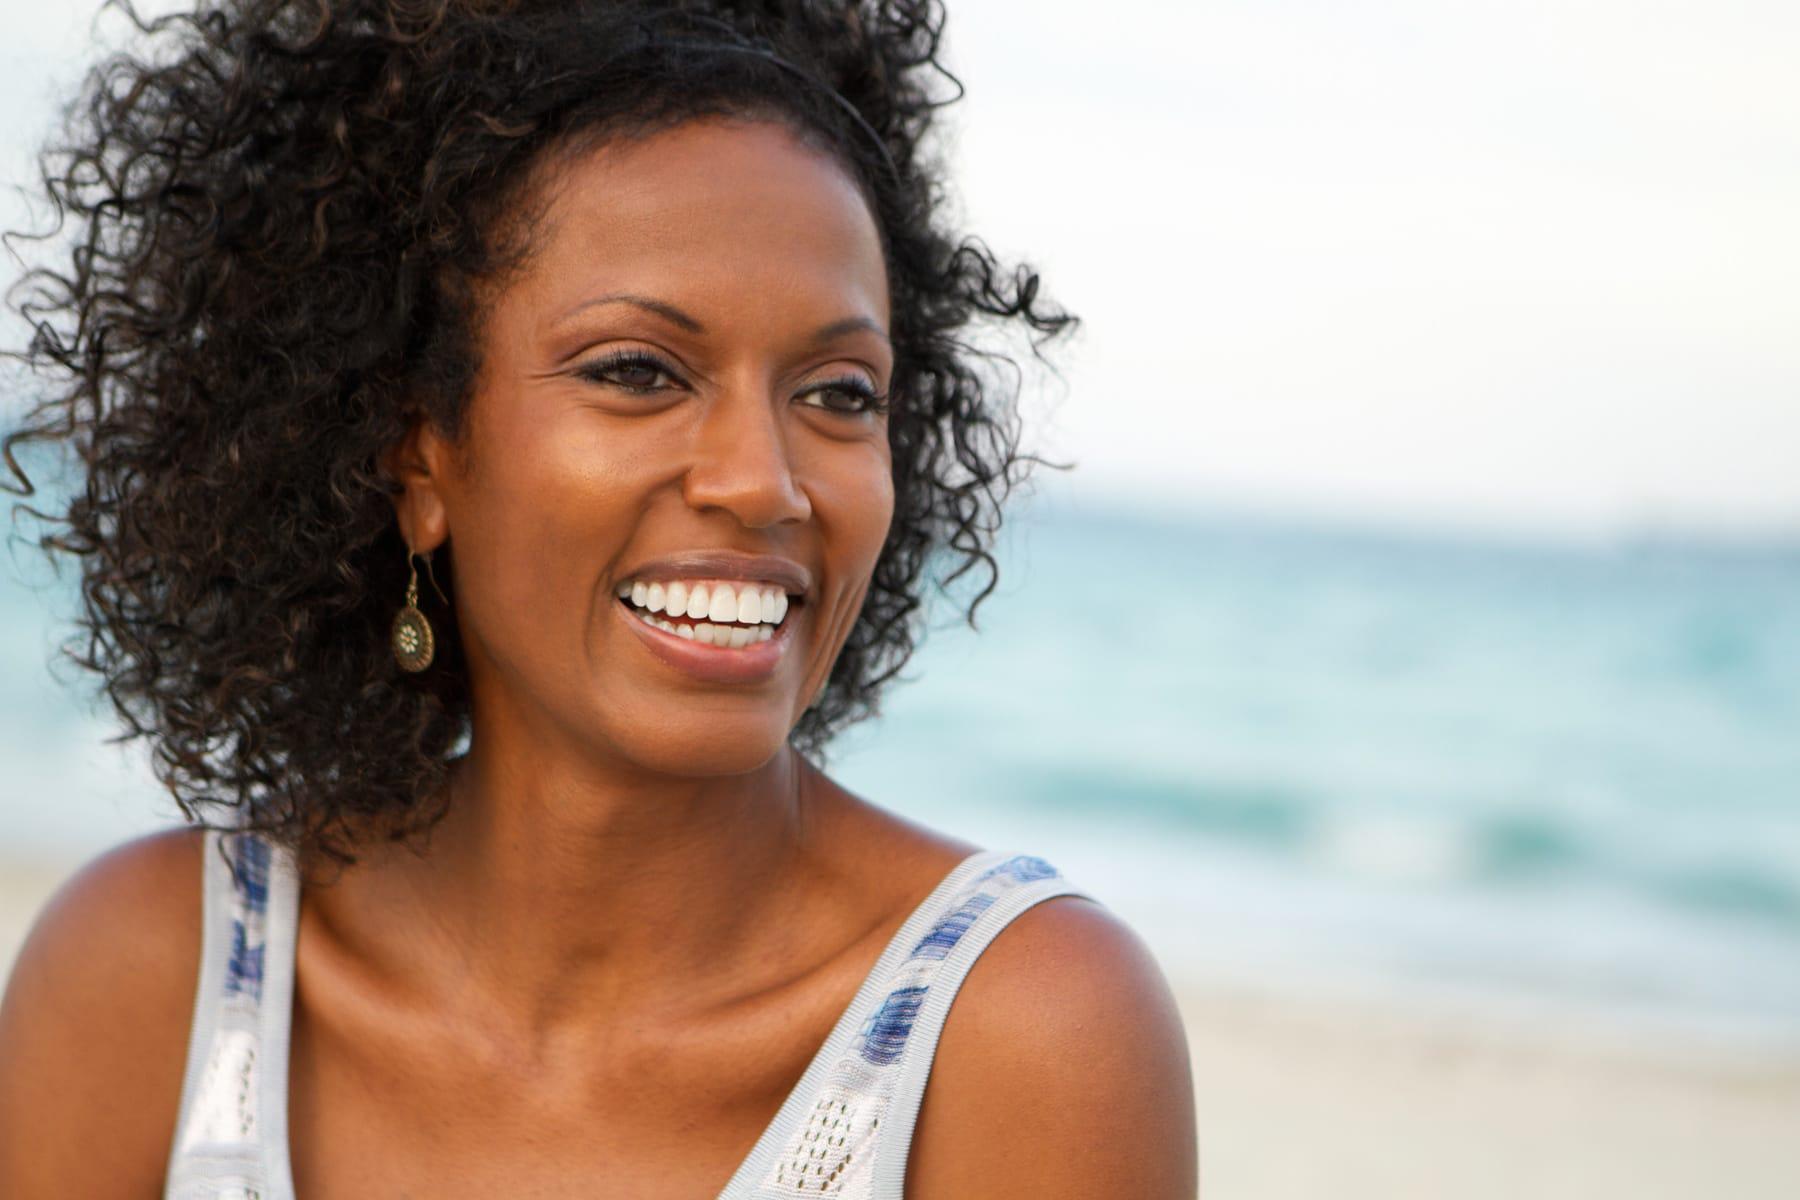 Beautiful mature woman smiling at the beach